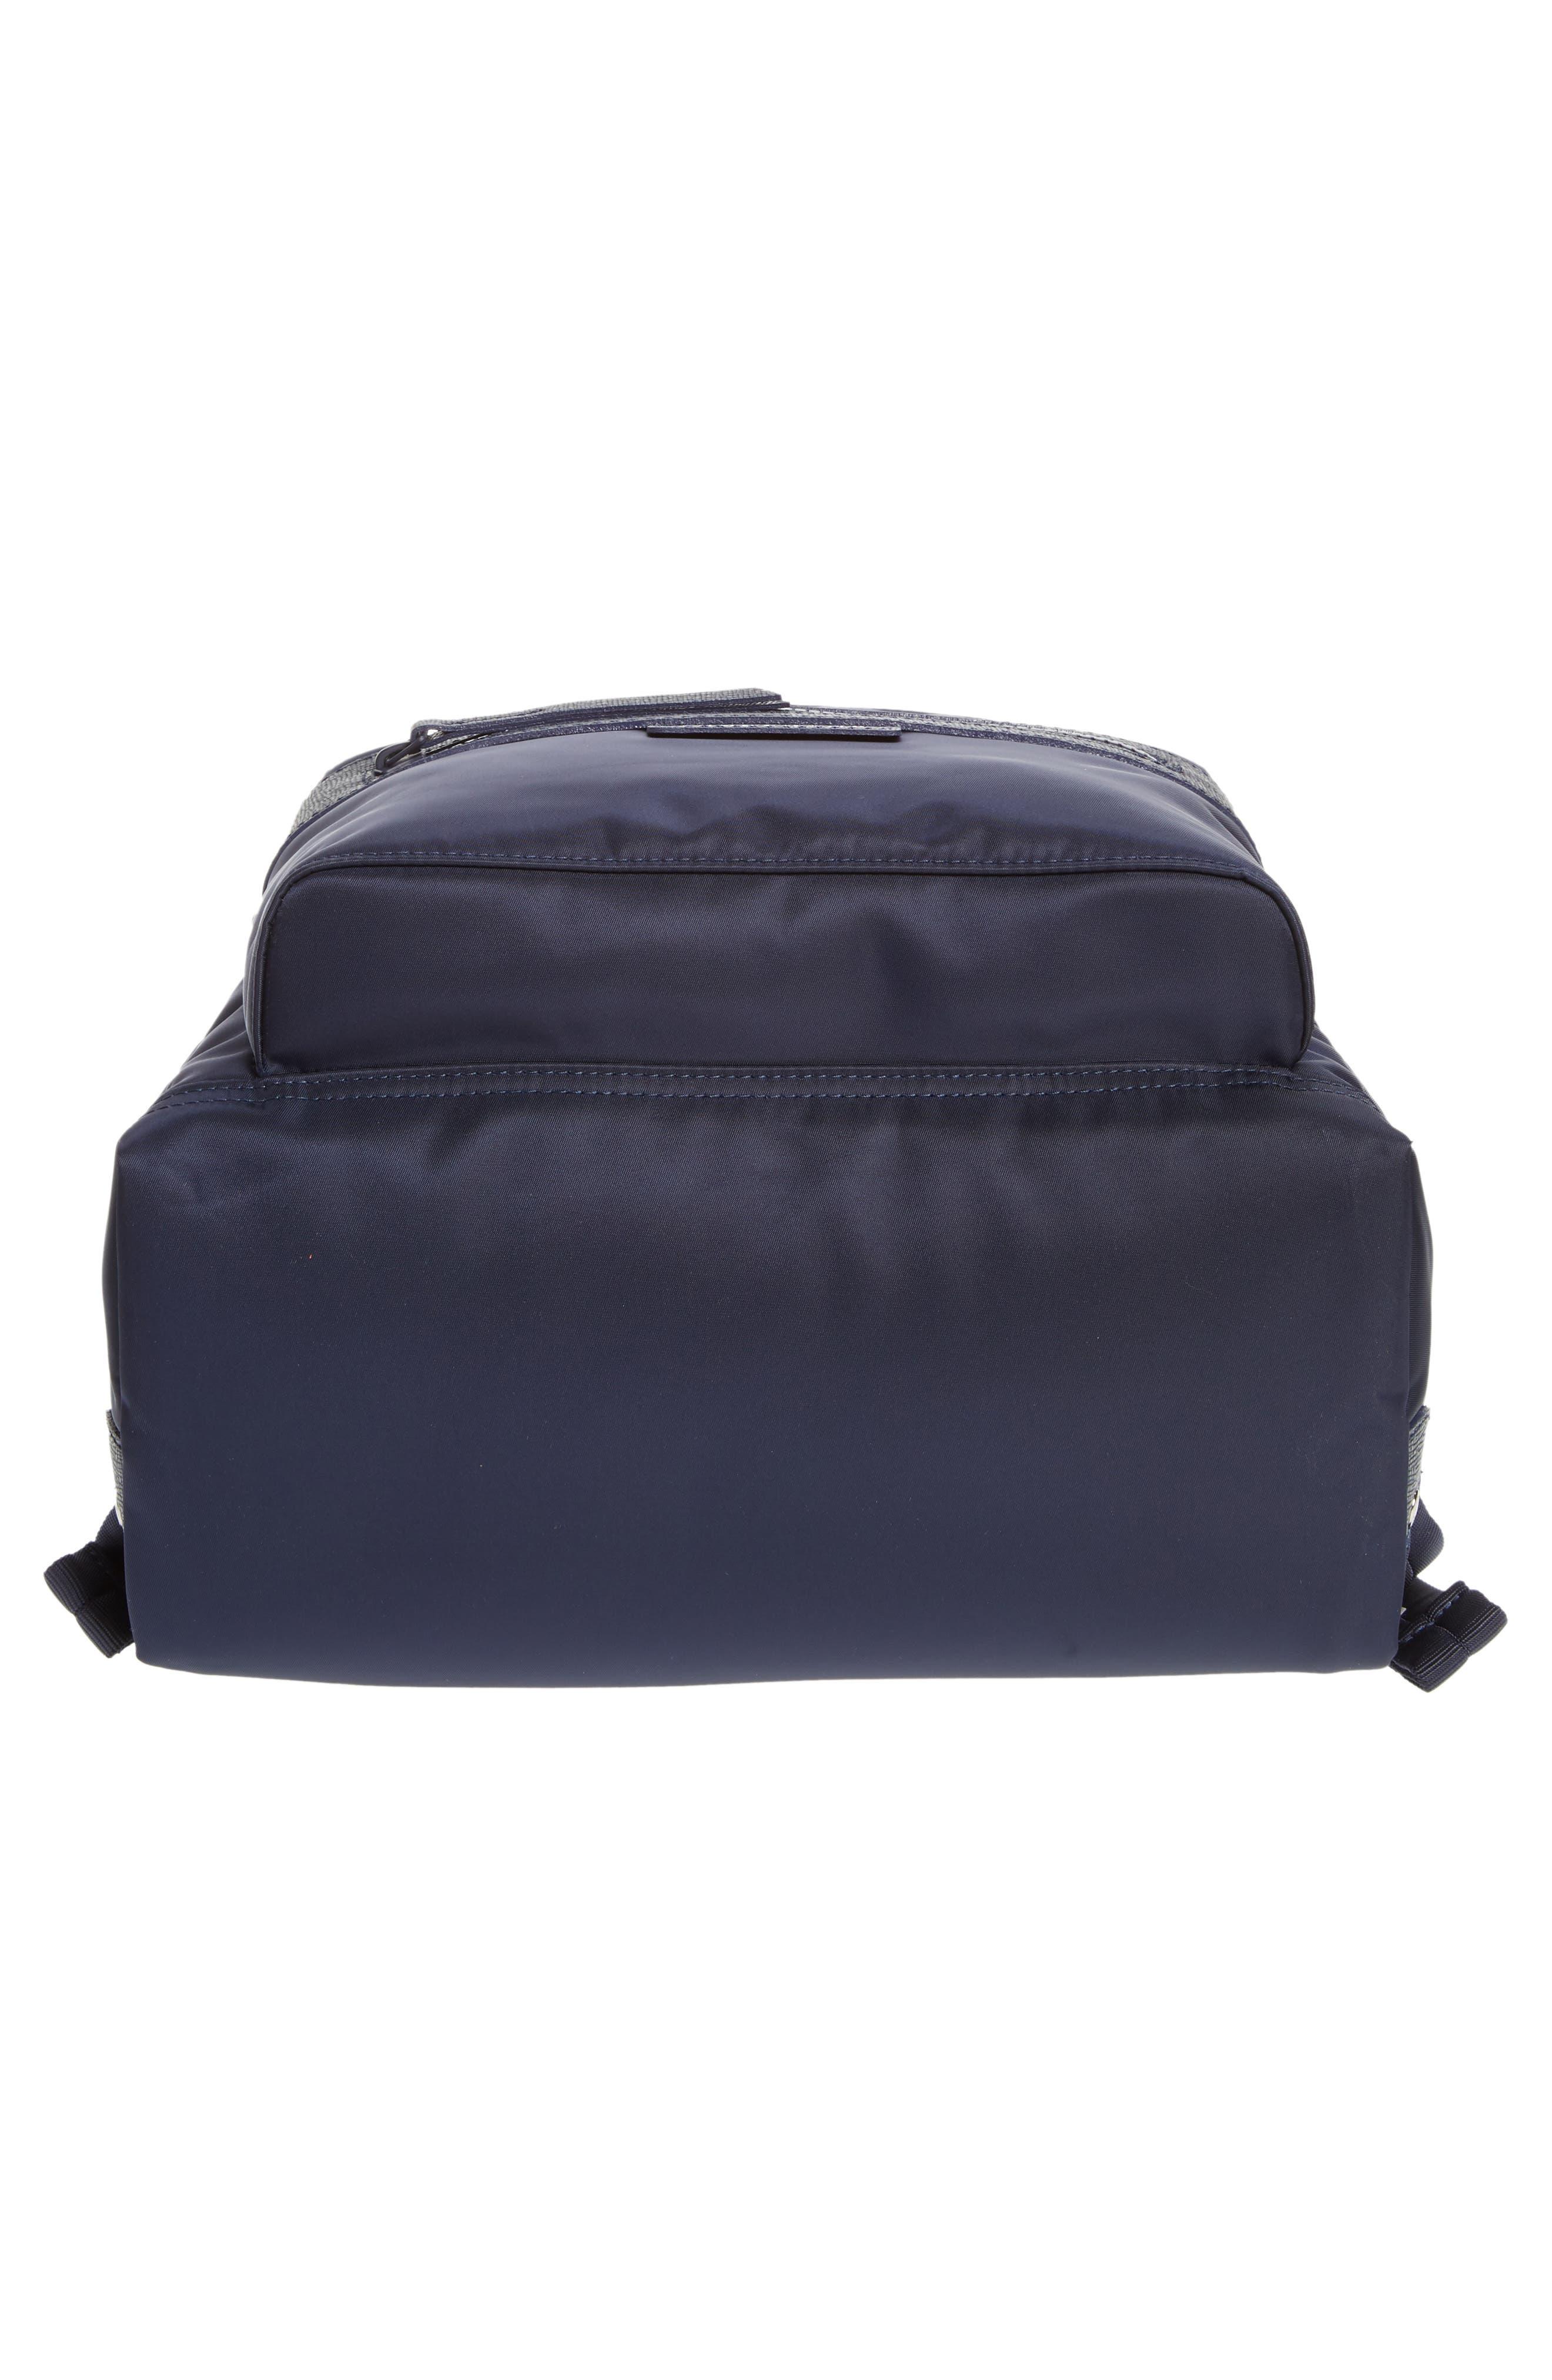 'Le Pliage Neo' Nylon Backpack,                             Alternate thumbnail 6, color,                             NAVY BLUE